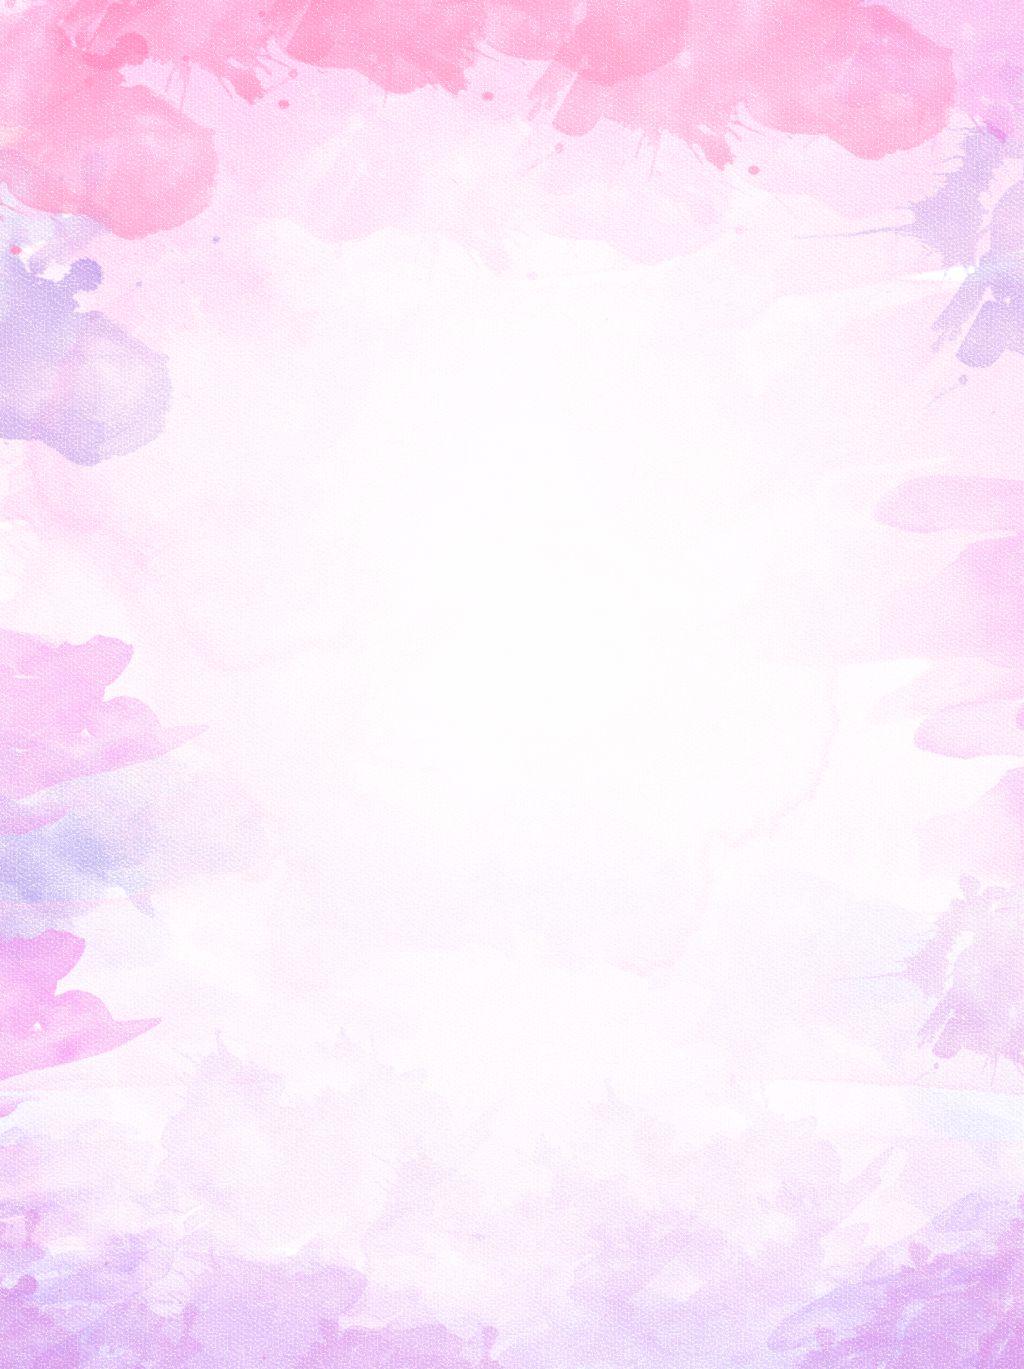 pink purple background photos  pink purple background